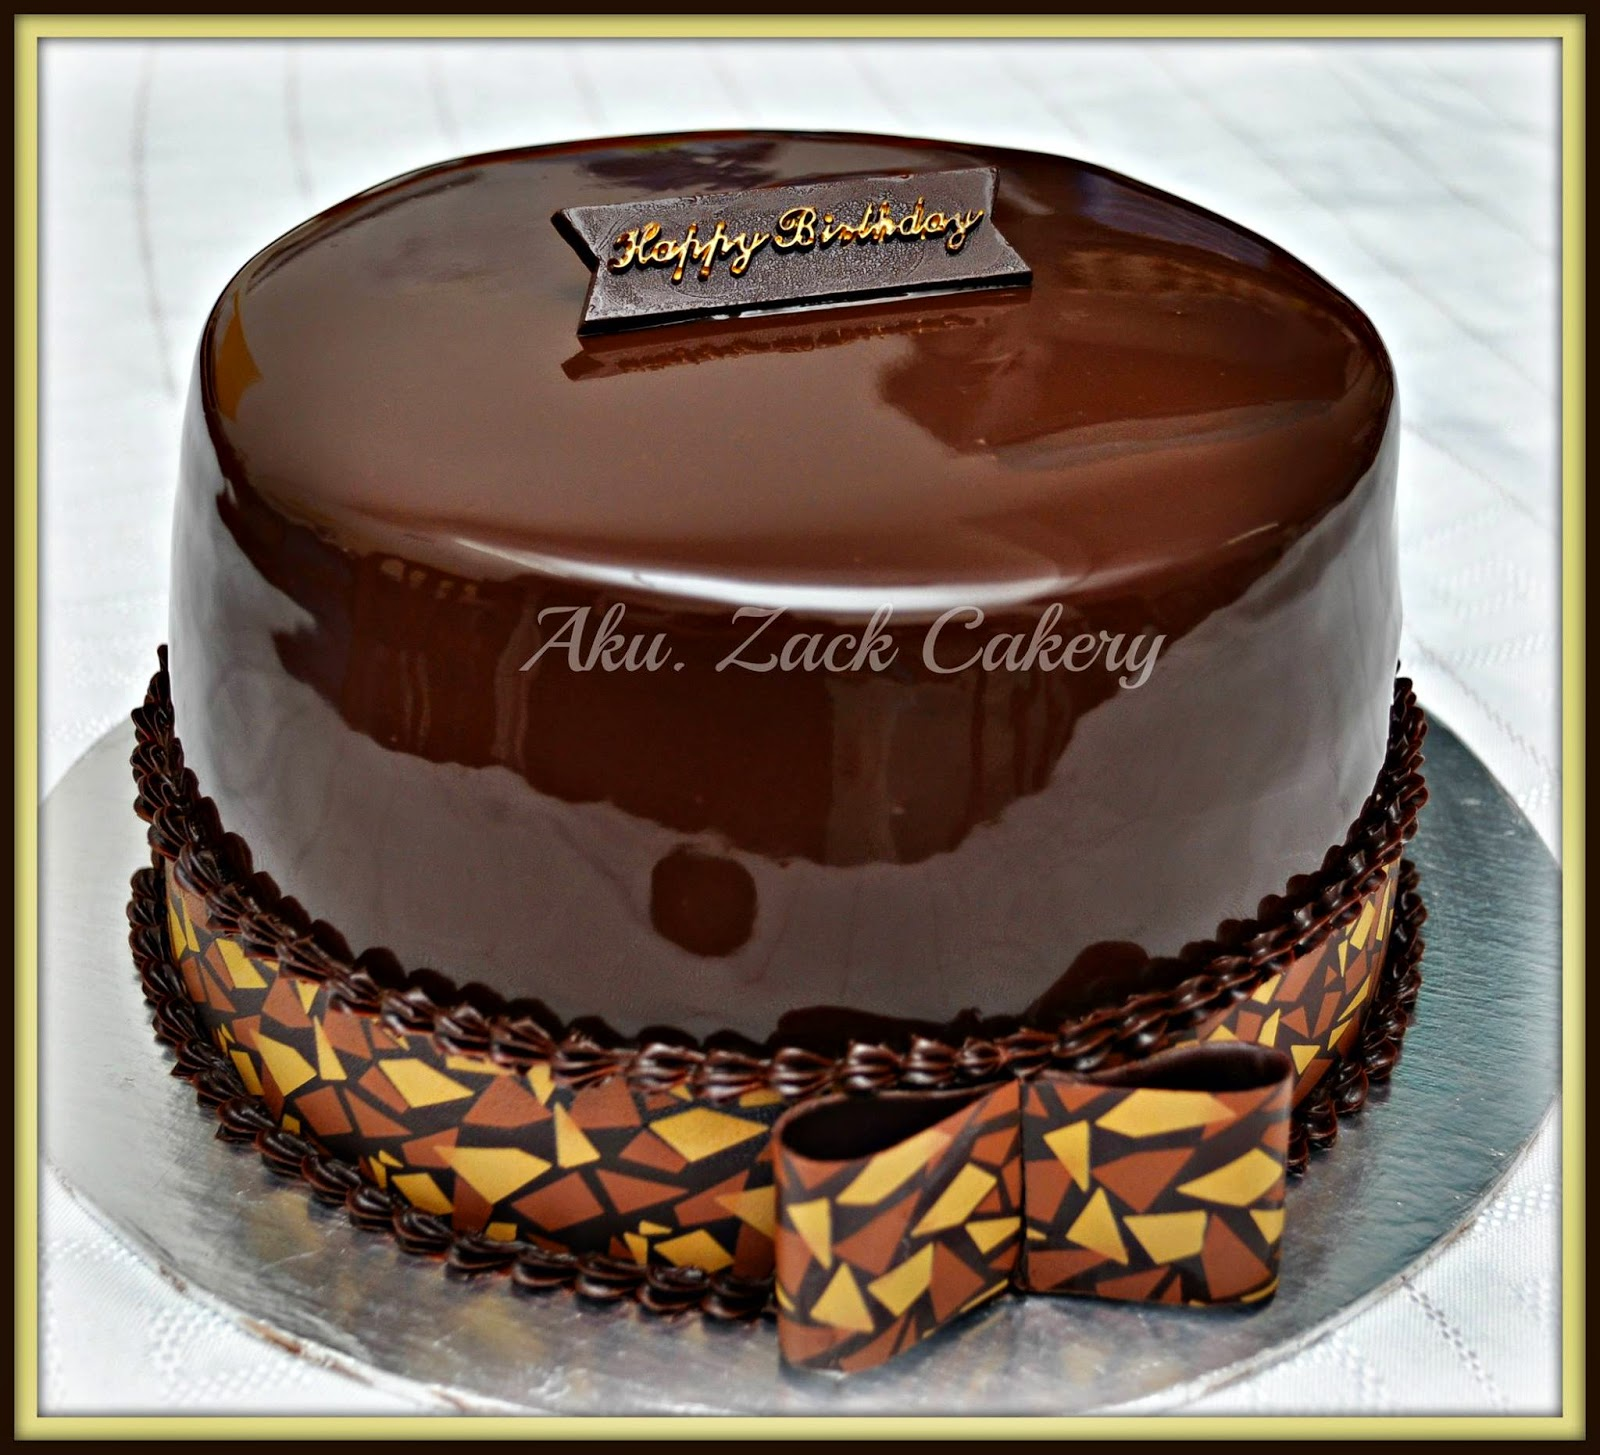 Russian Black White Cake